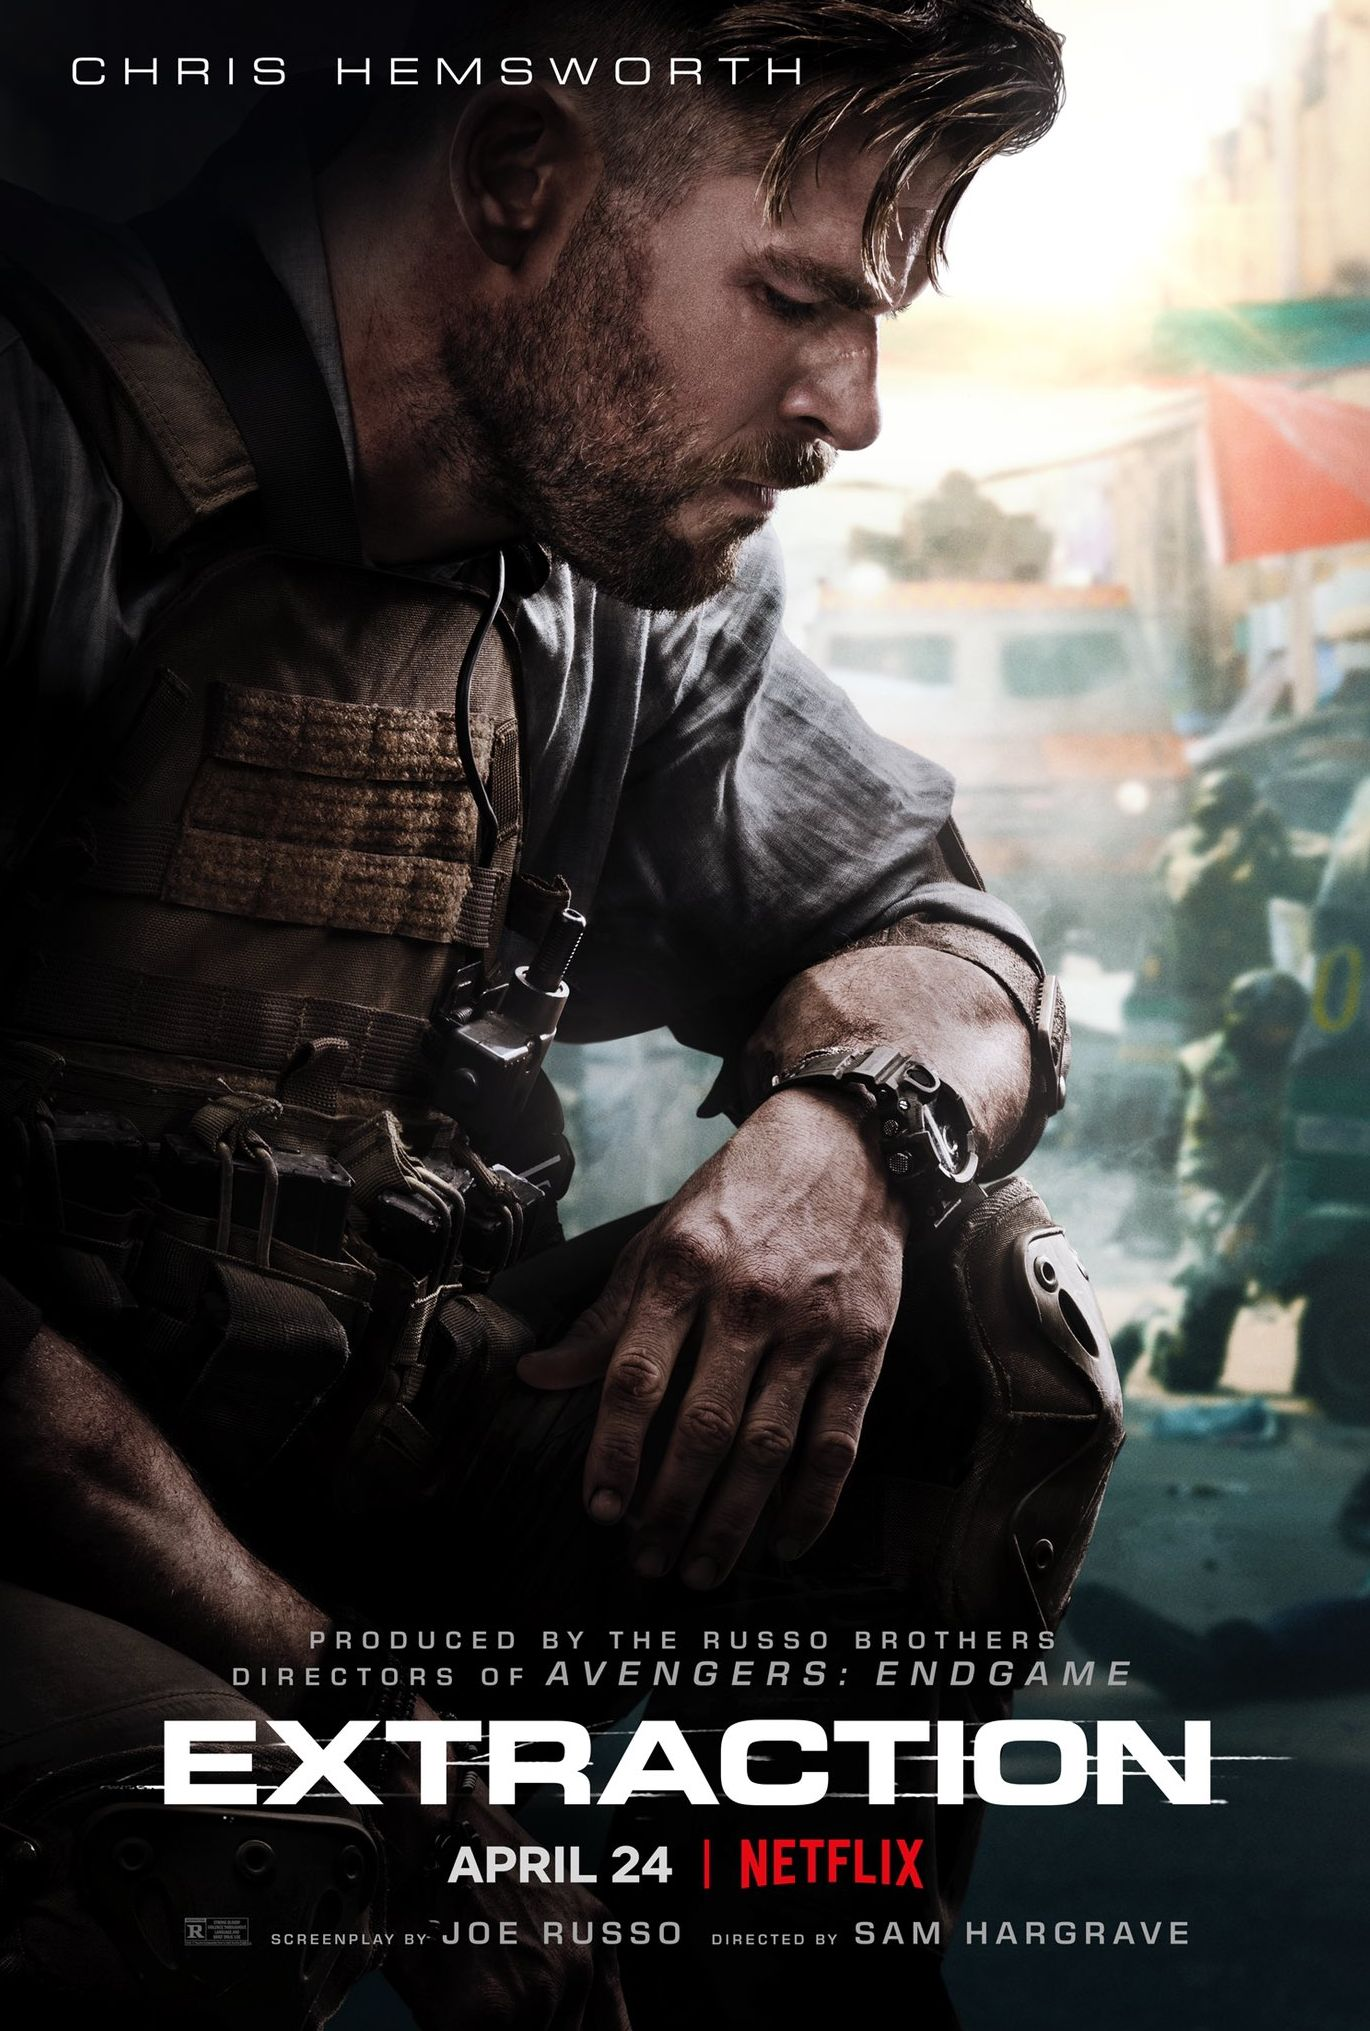 'Extraction' poster - Chris Hemsworth (Netflix)